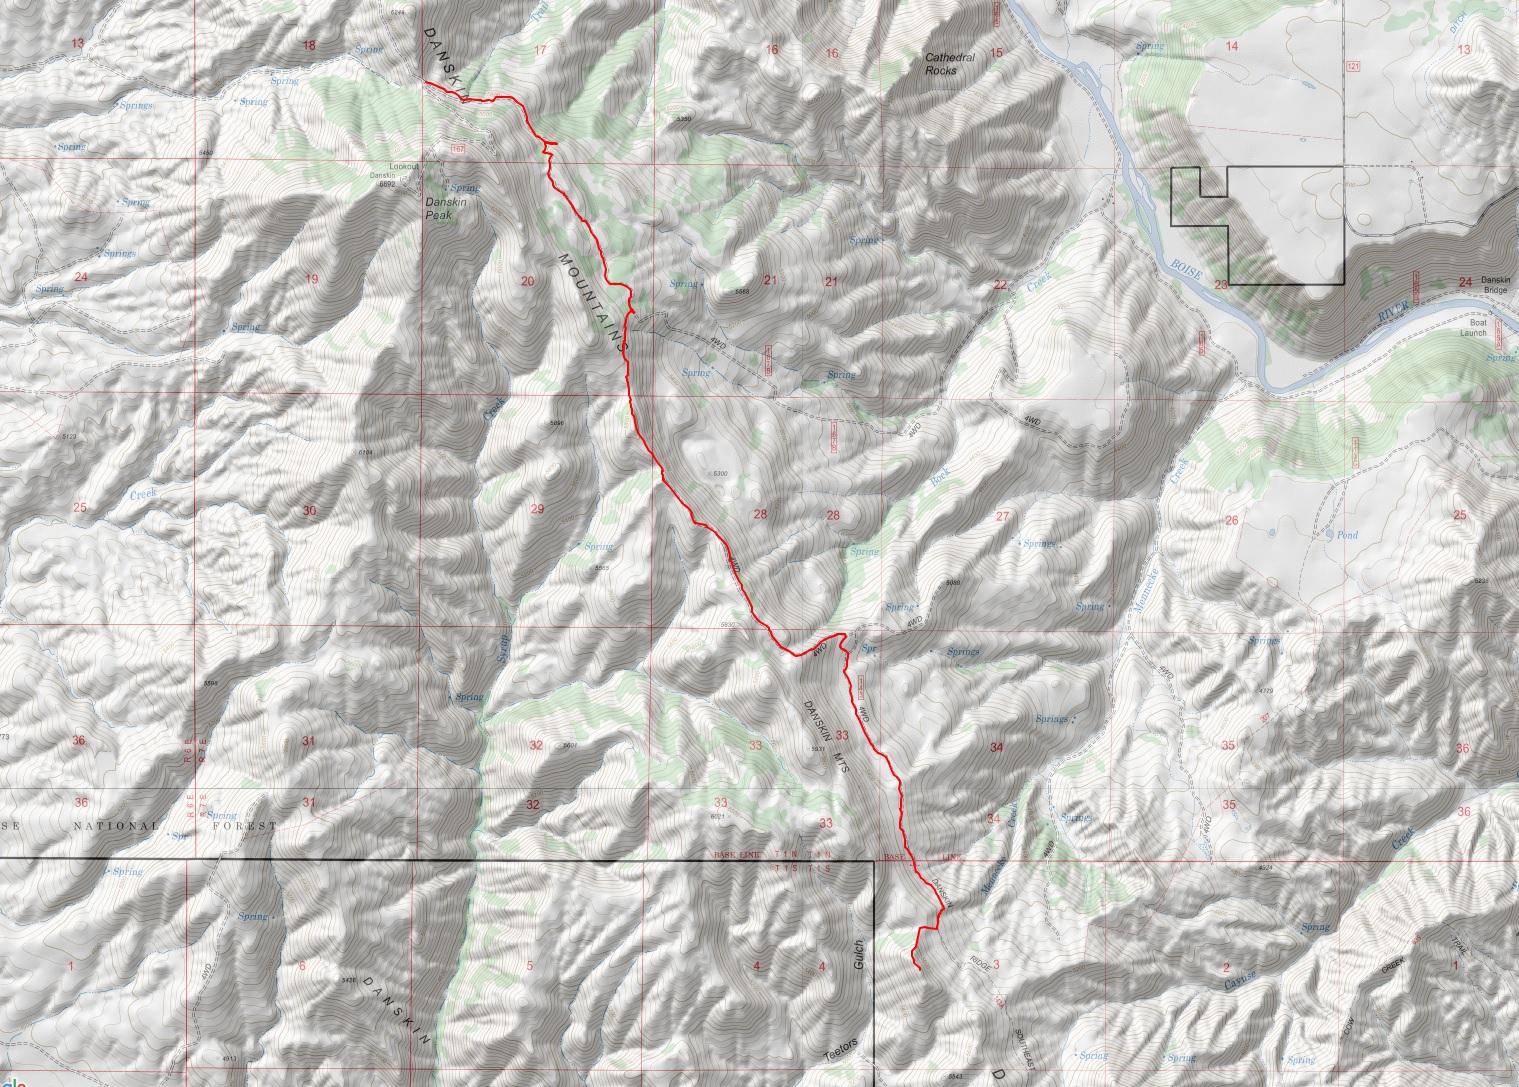 DANSKIN SOUTHEAST RIDGE TRAIL#143A01 GPS Track.